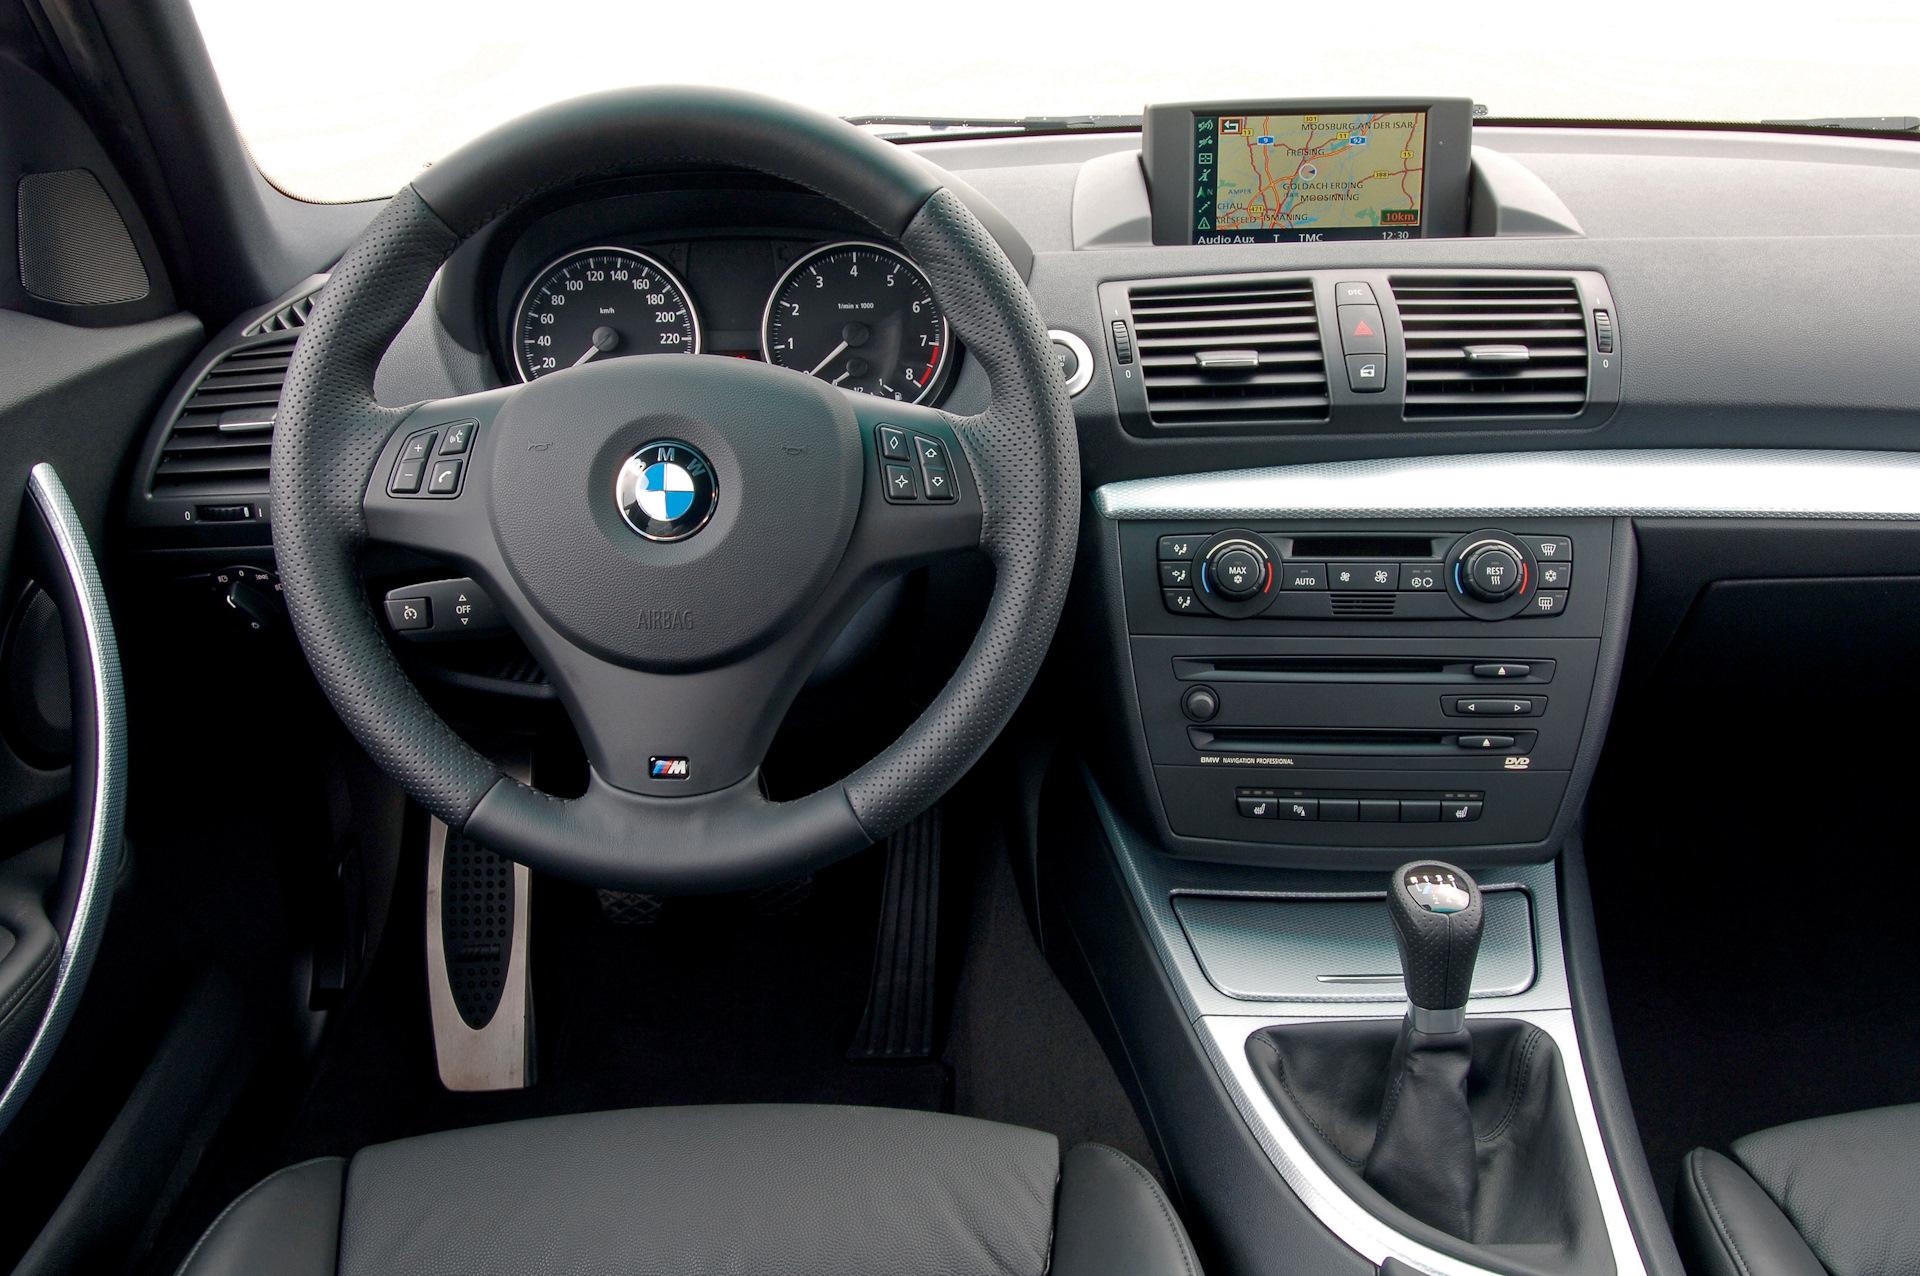 Замена штатного руля BMW 1-Series Е87 на М-версию